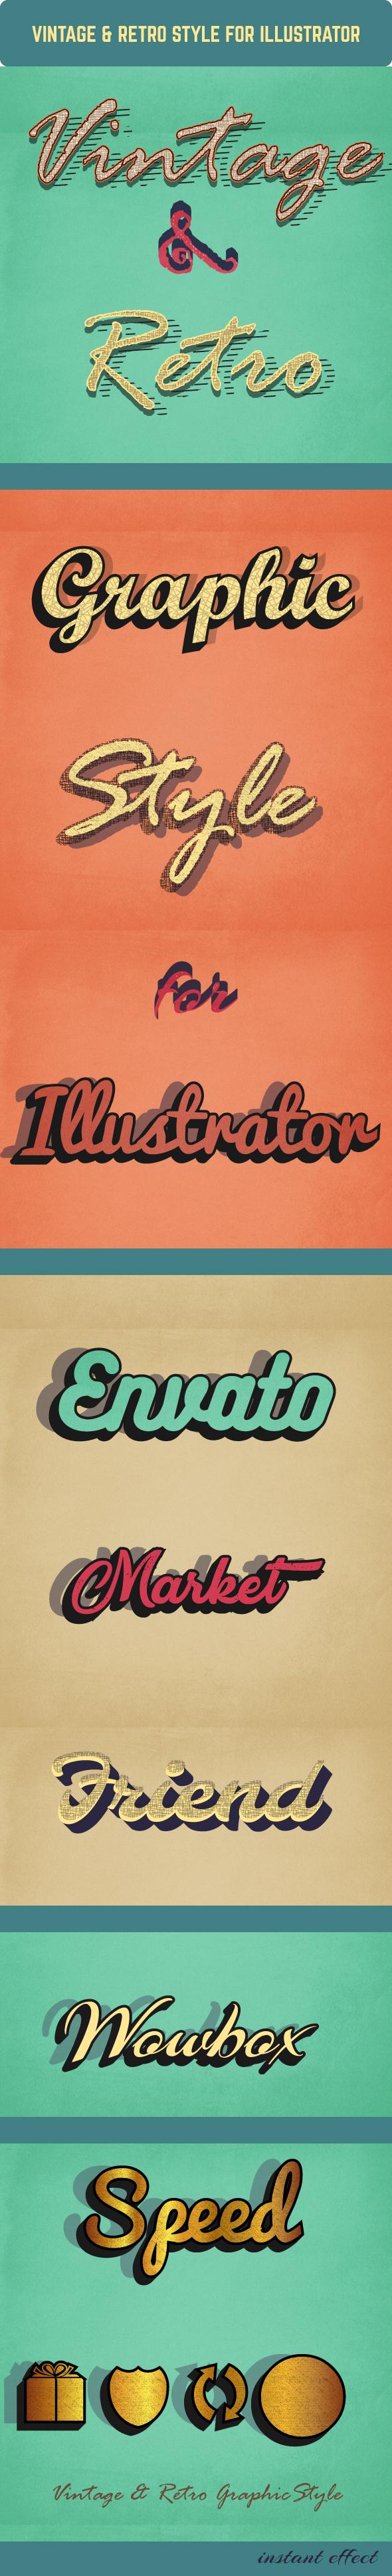 Vintage & Retro Graphic Styles for Illustrator - Styles Illustrator